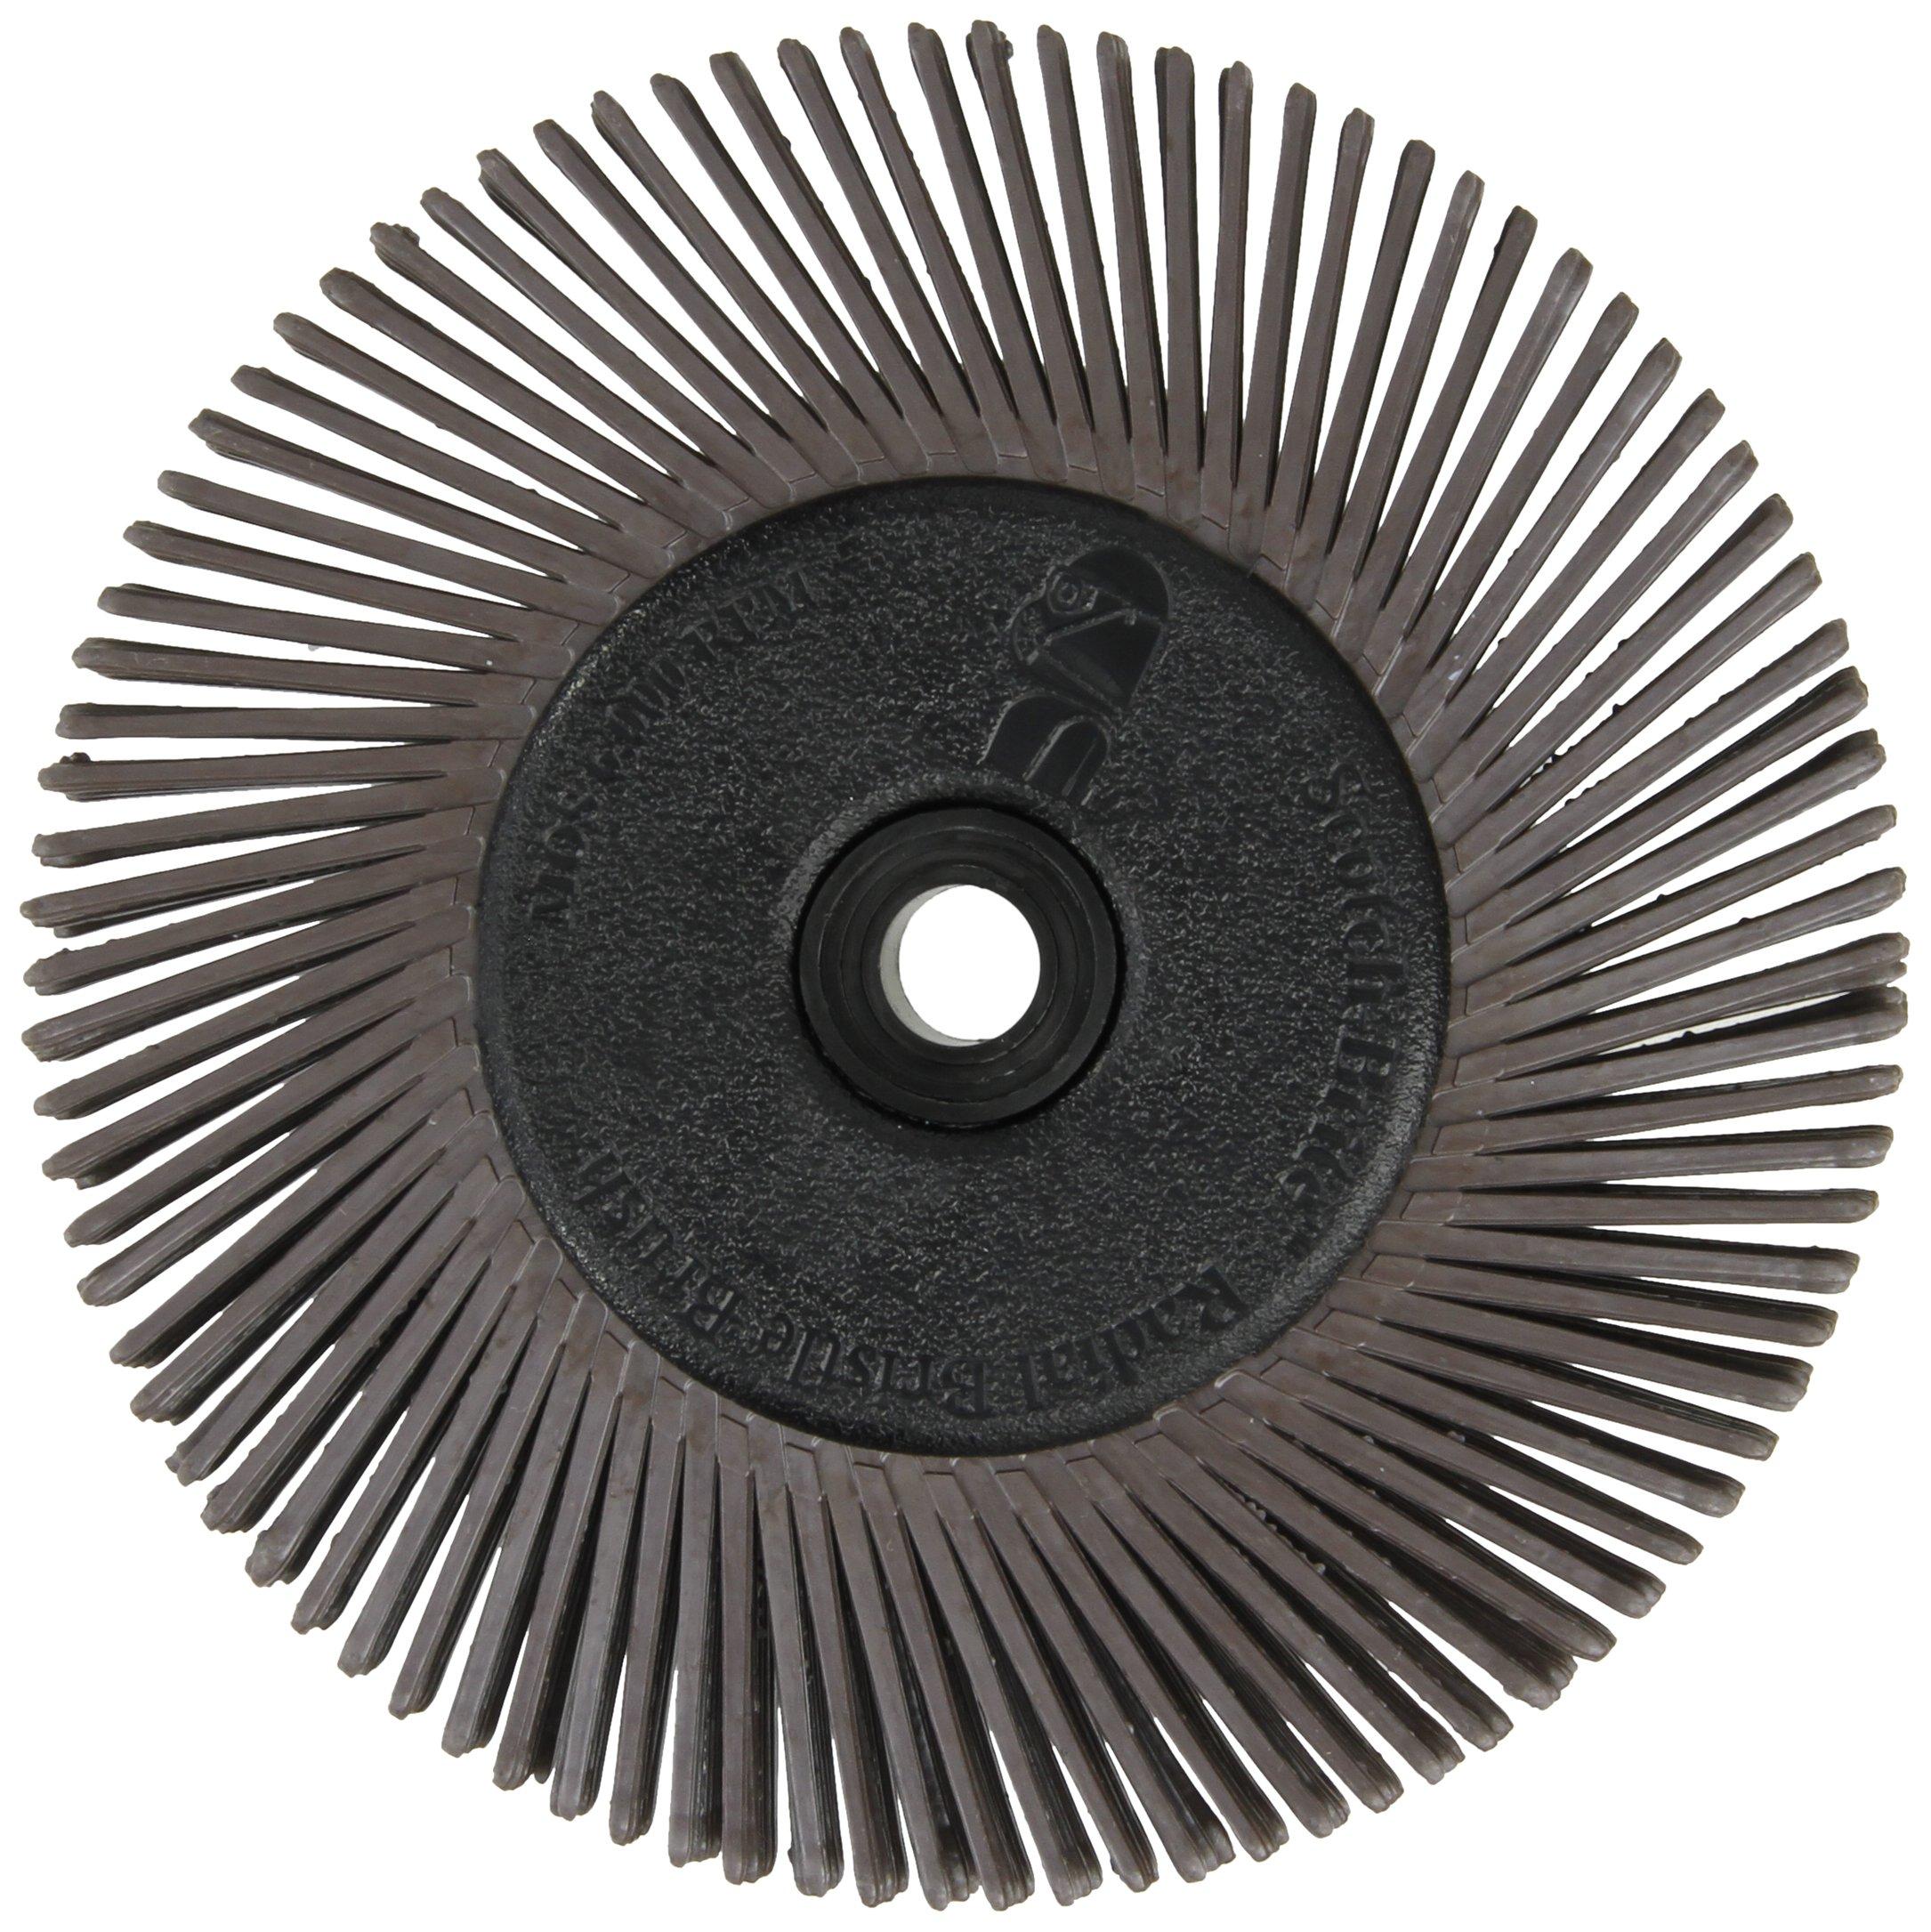 Scotch-Brite(TM) Radial Bristle Brush, Cubitron/Aluminum Oxide, 6000 rpm, 6 Diameter x 1/2 Width, 36 Grit (Pack of 1)